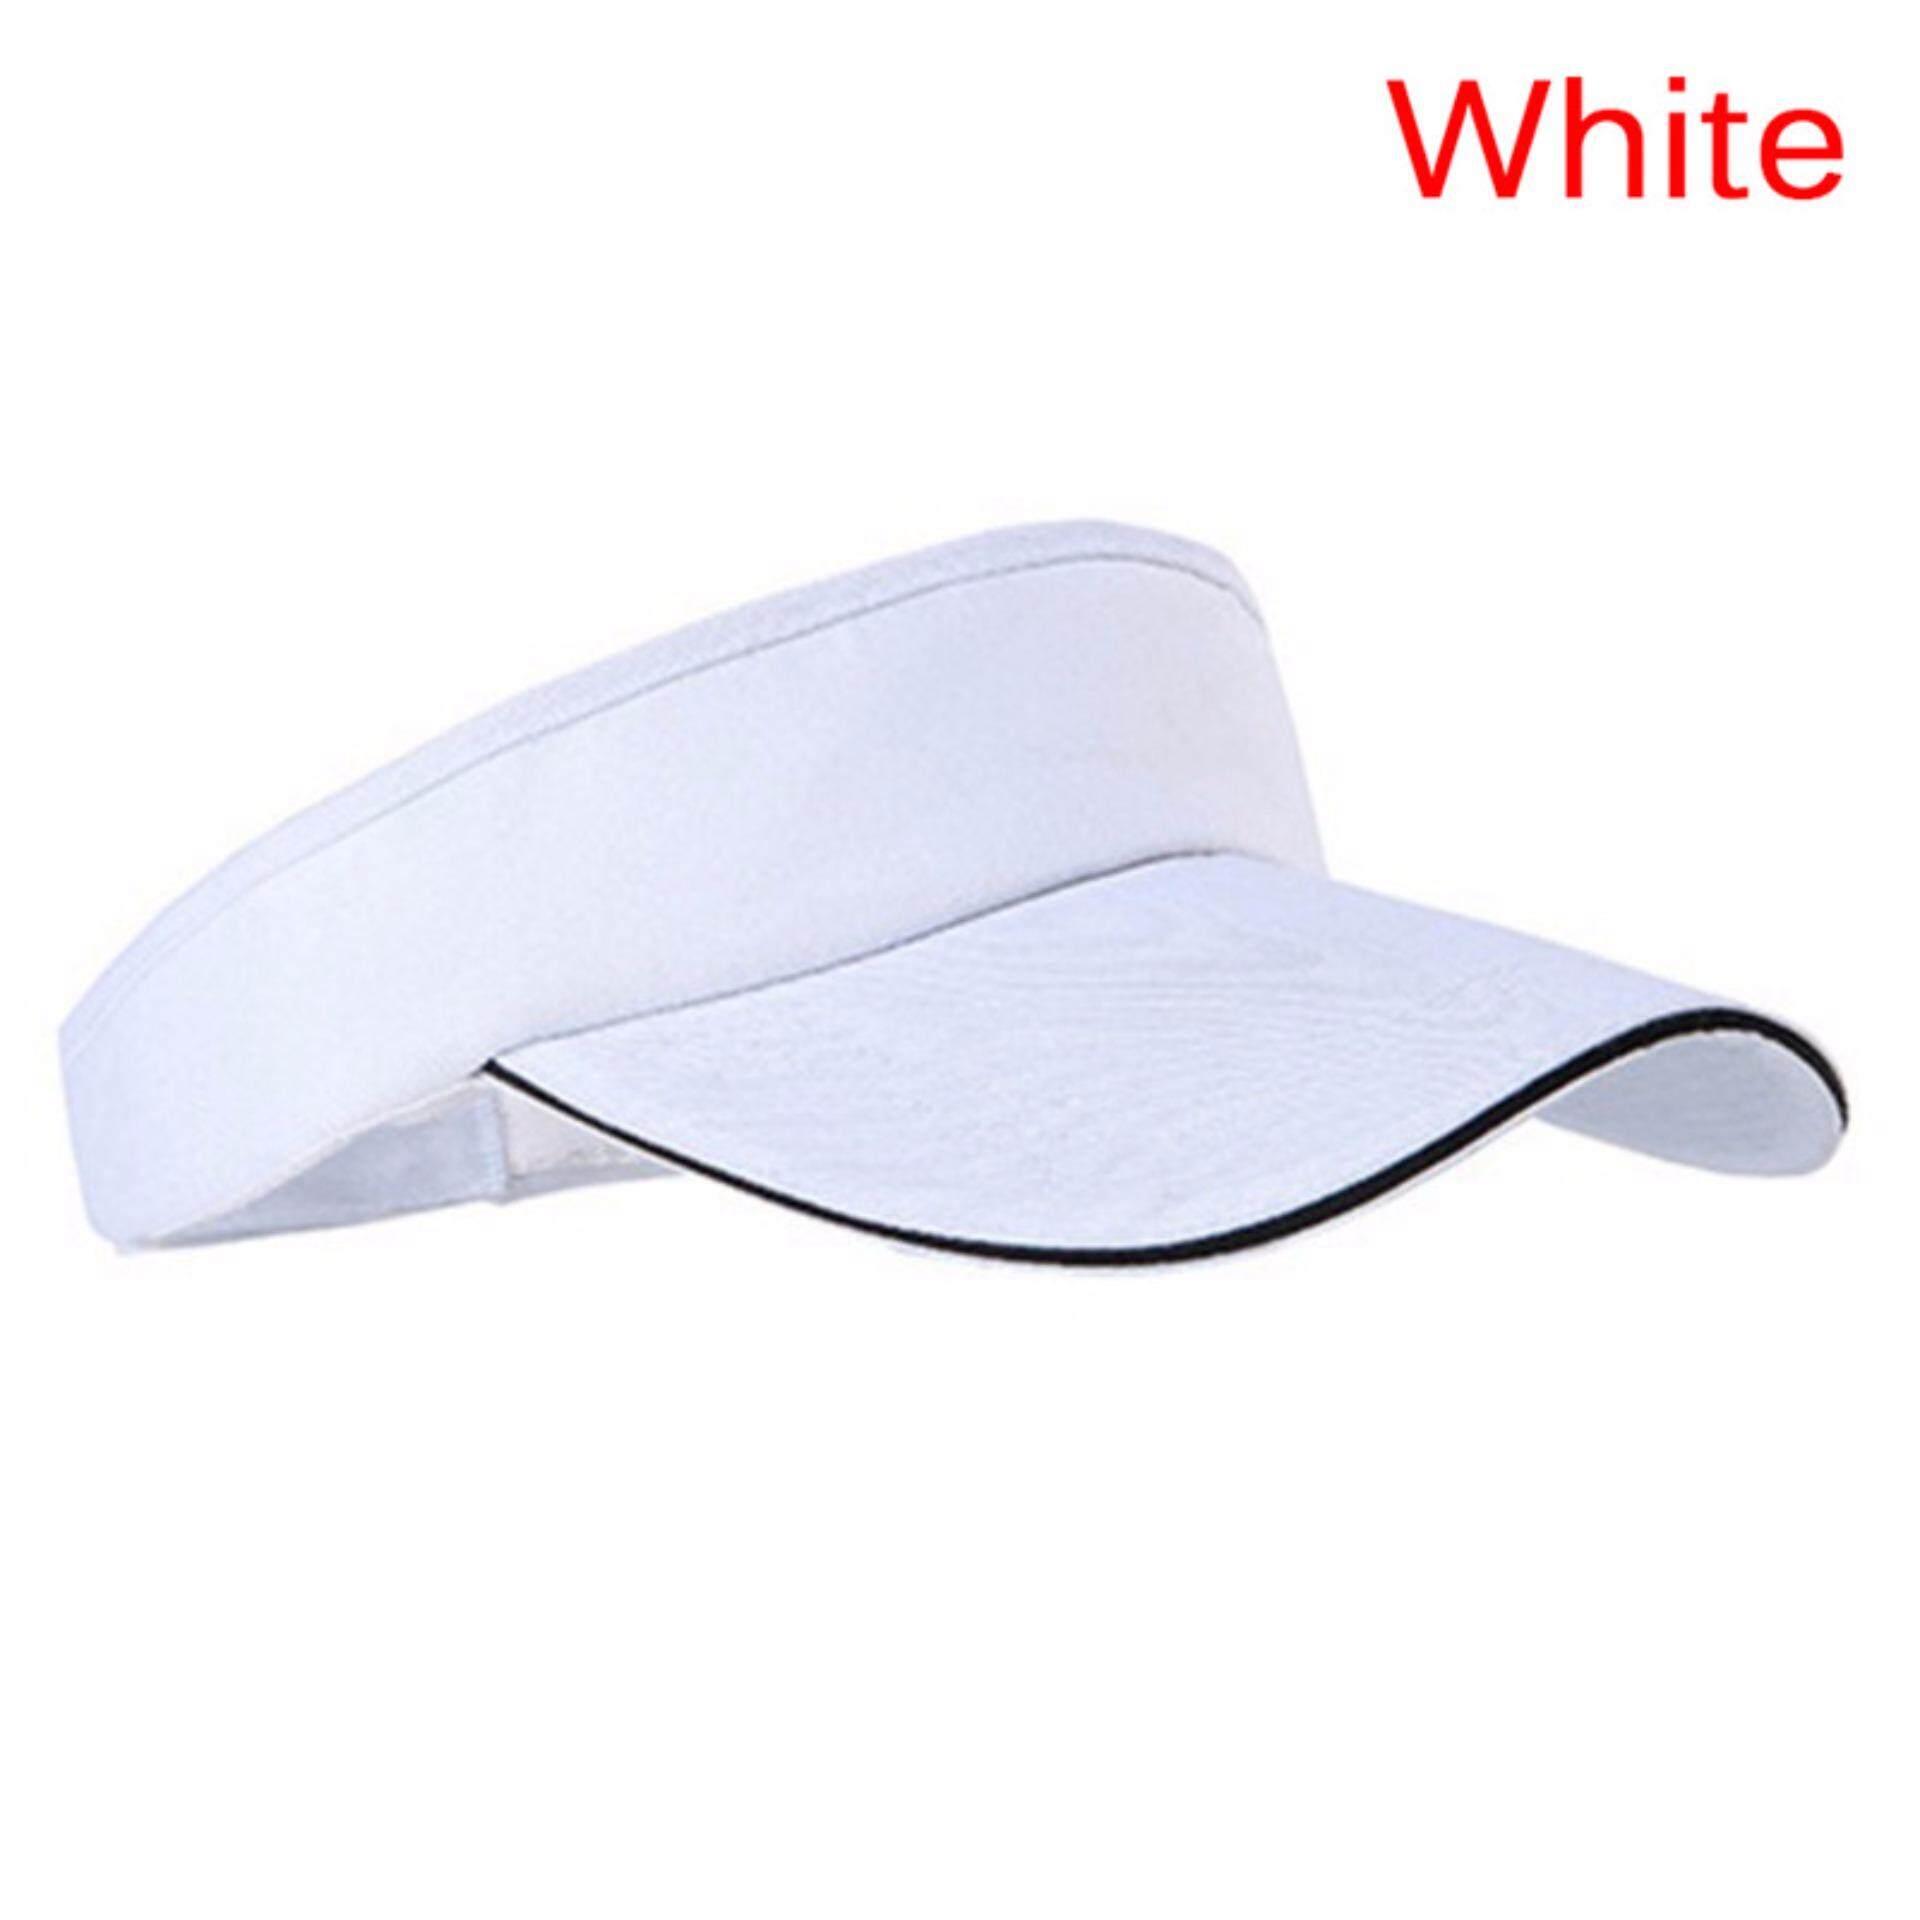 Adjustable Unisex Men Women Plain Sun Visor Sport Golf Tennis Breathable Cap Hat By Magical House.